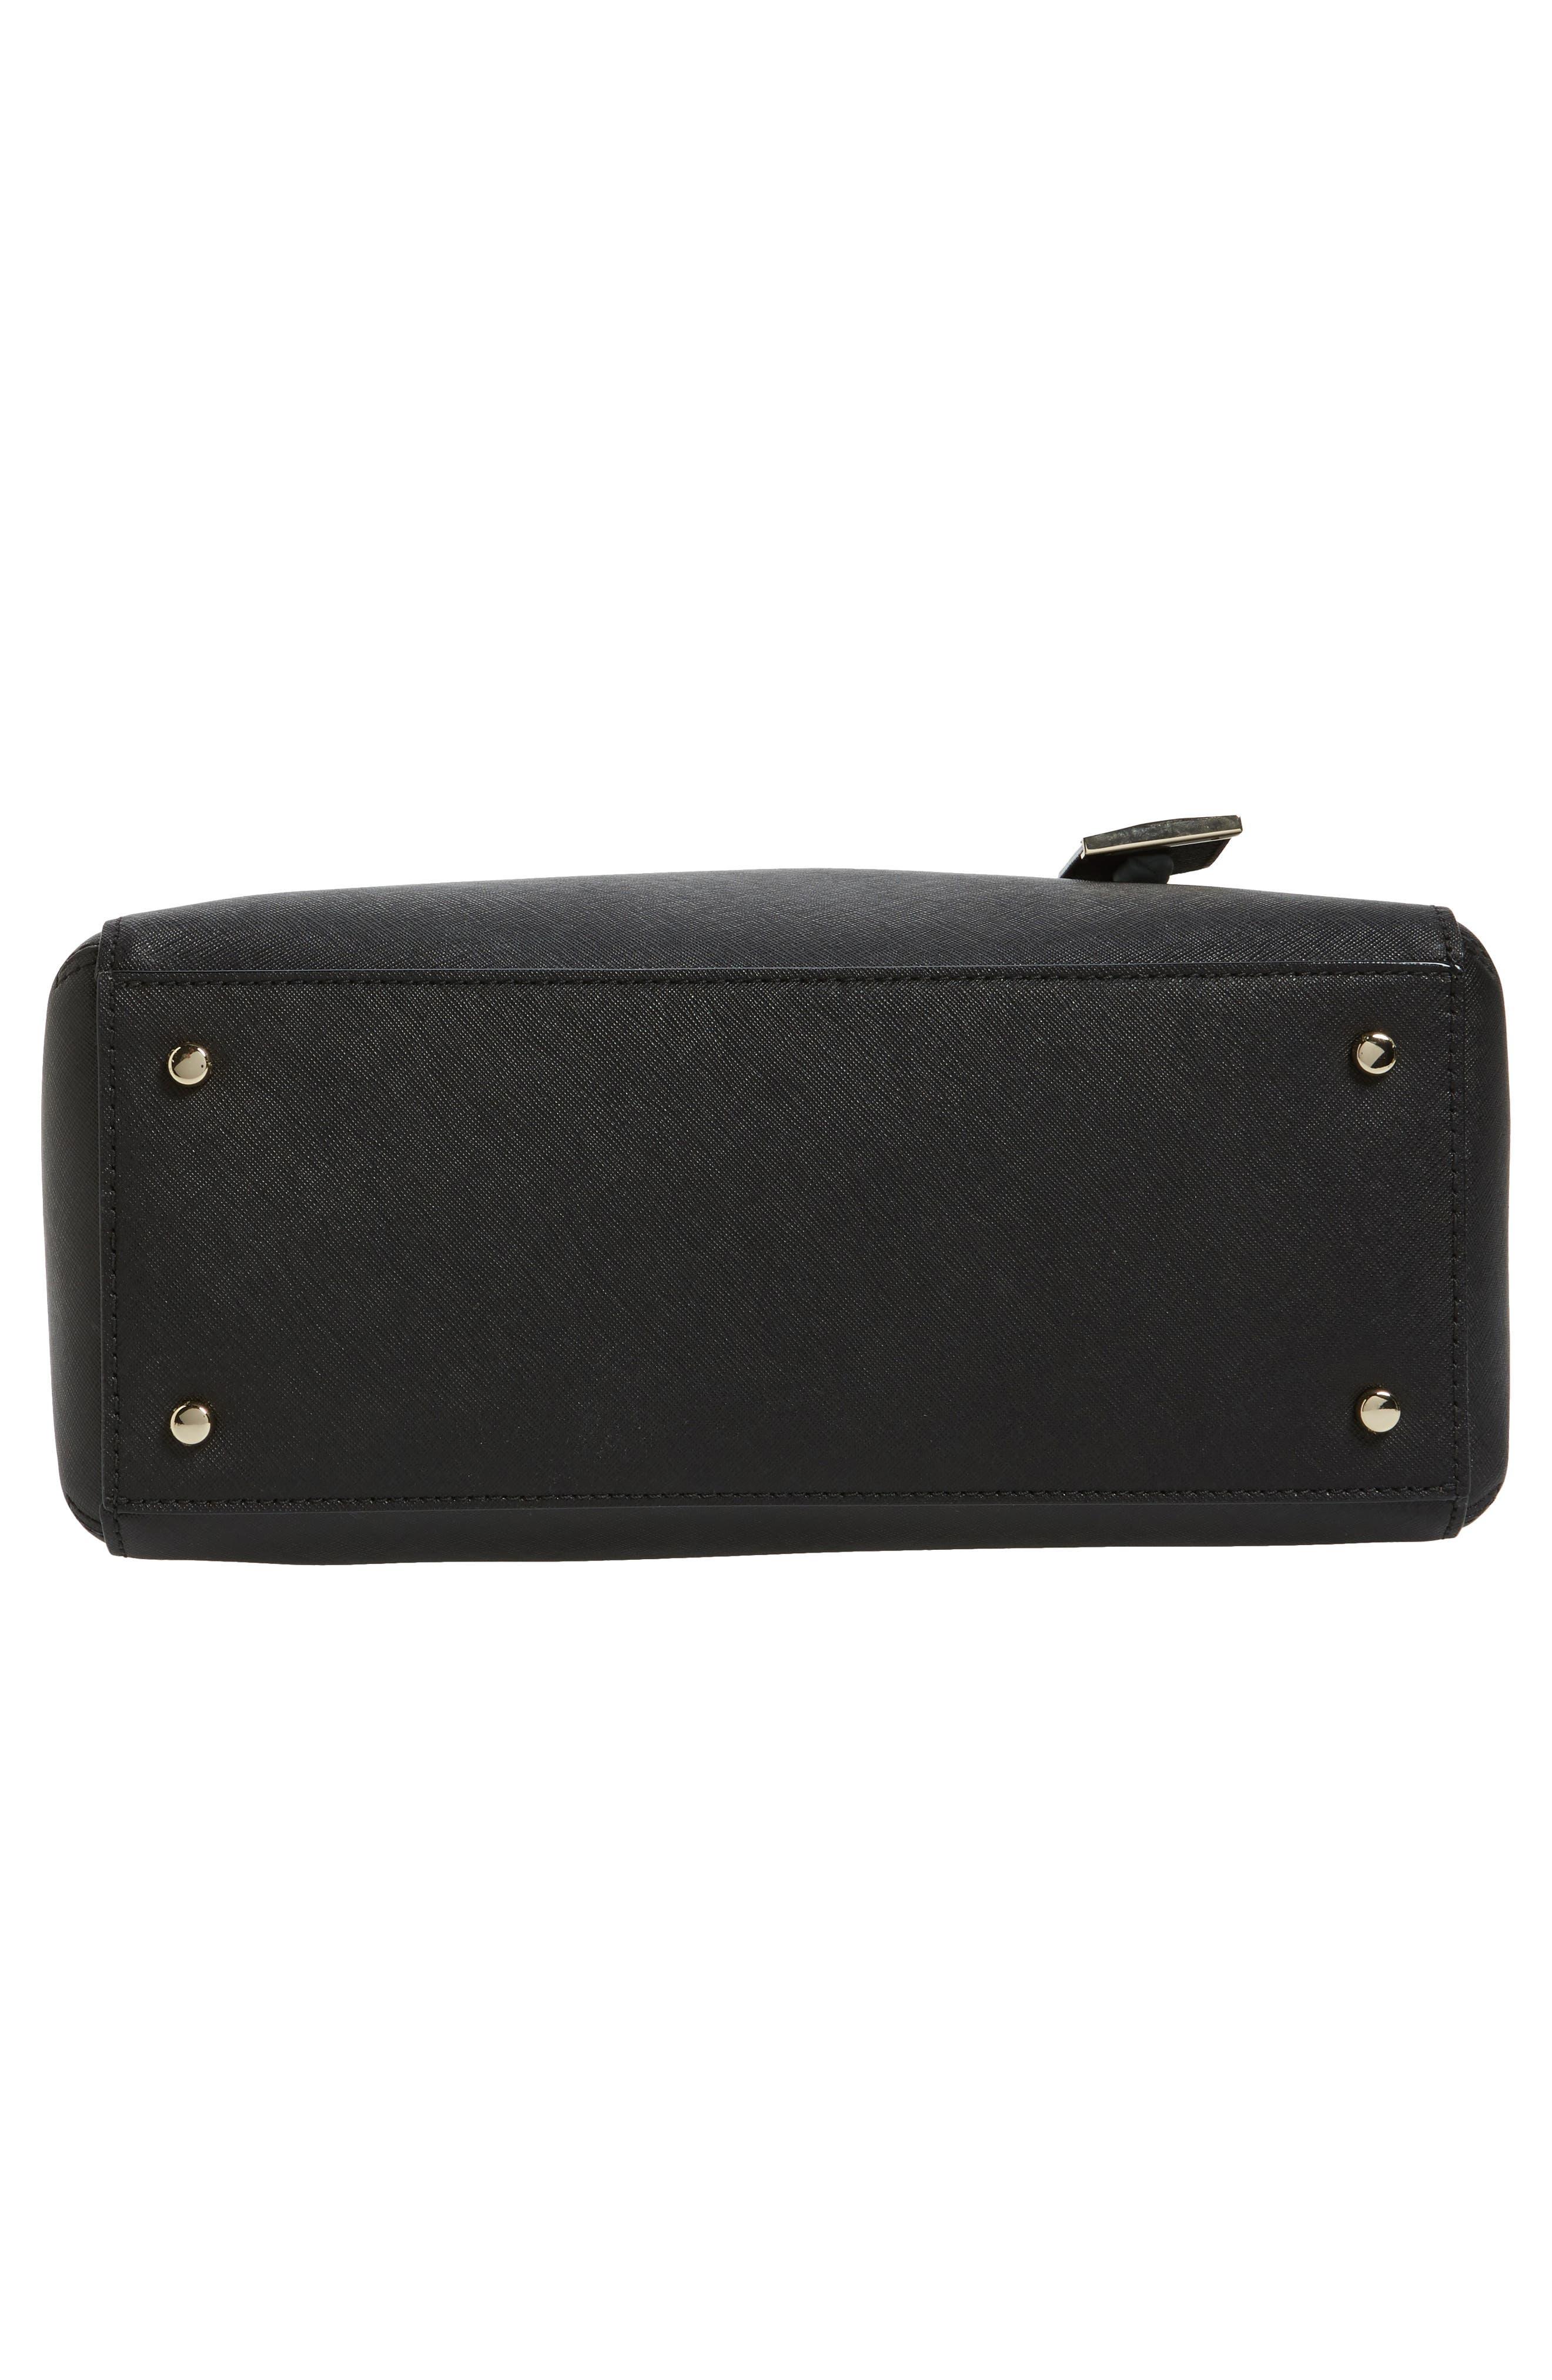 mega cameron street - lane leather satchel,                             Alternate thumbnail 5, color,                             Black